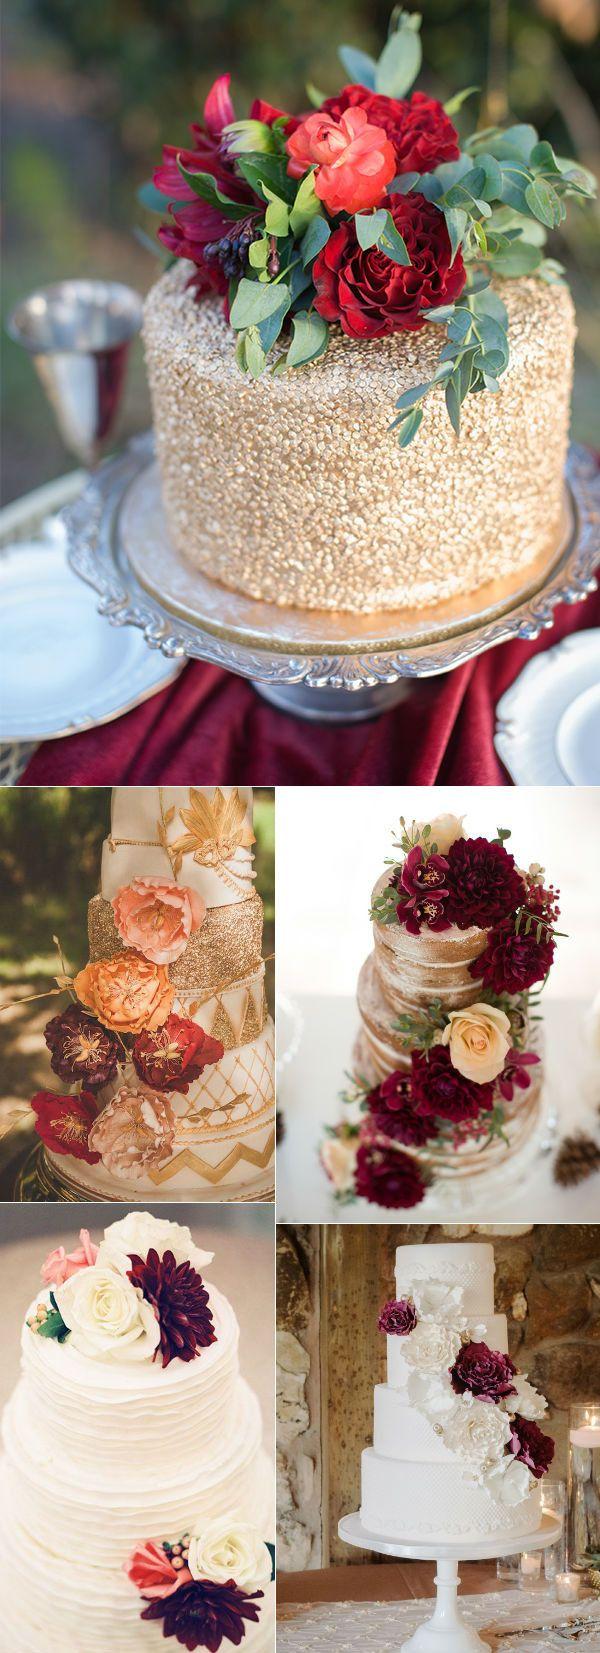 Best 25+ Small wedding cakes ideas on Pinterest | Wedding cakes ...